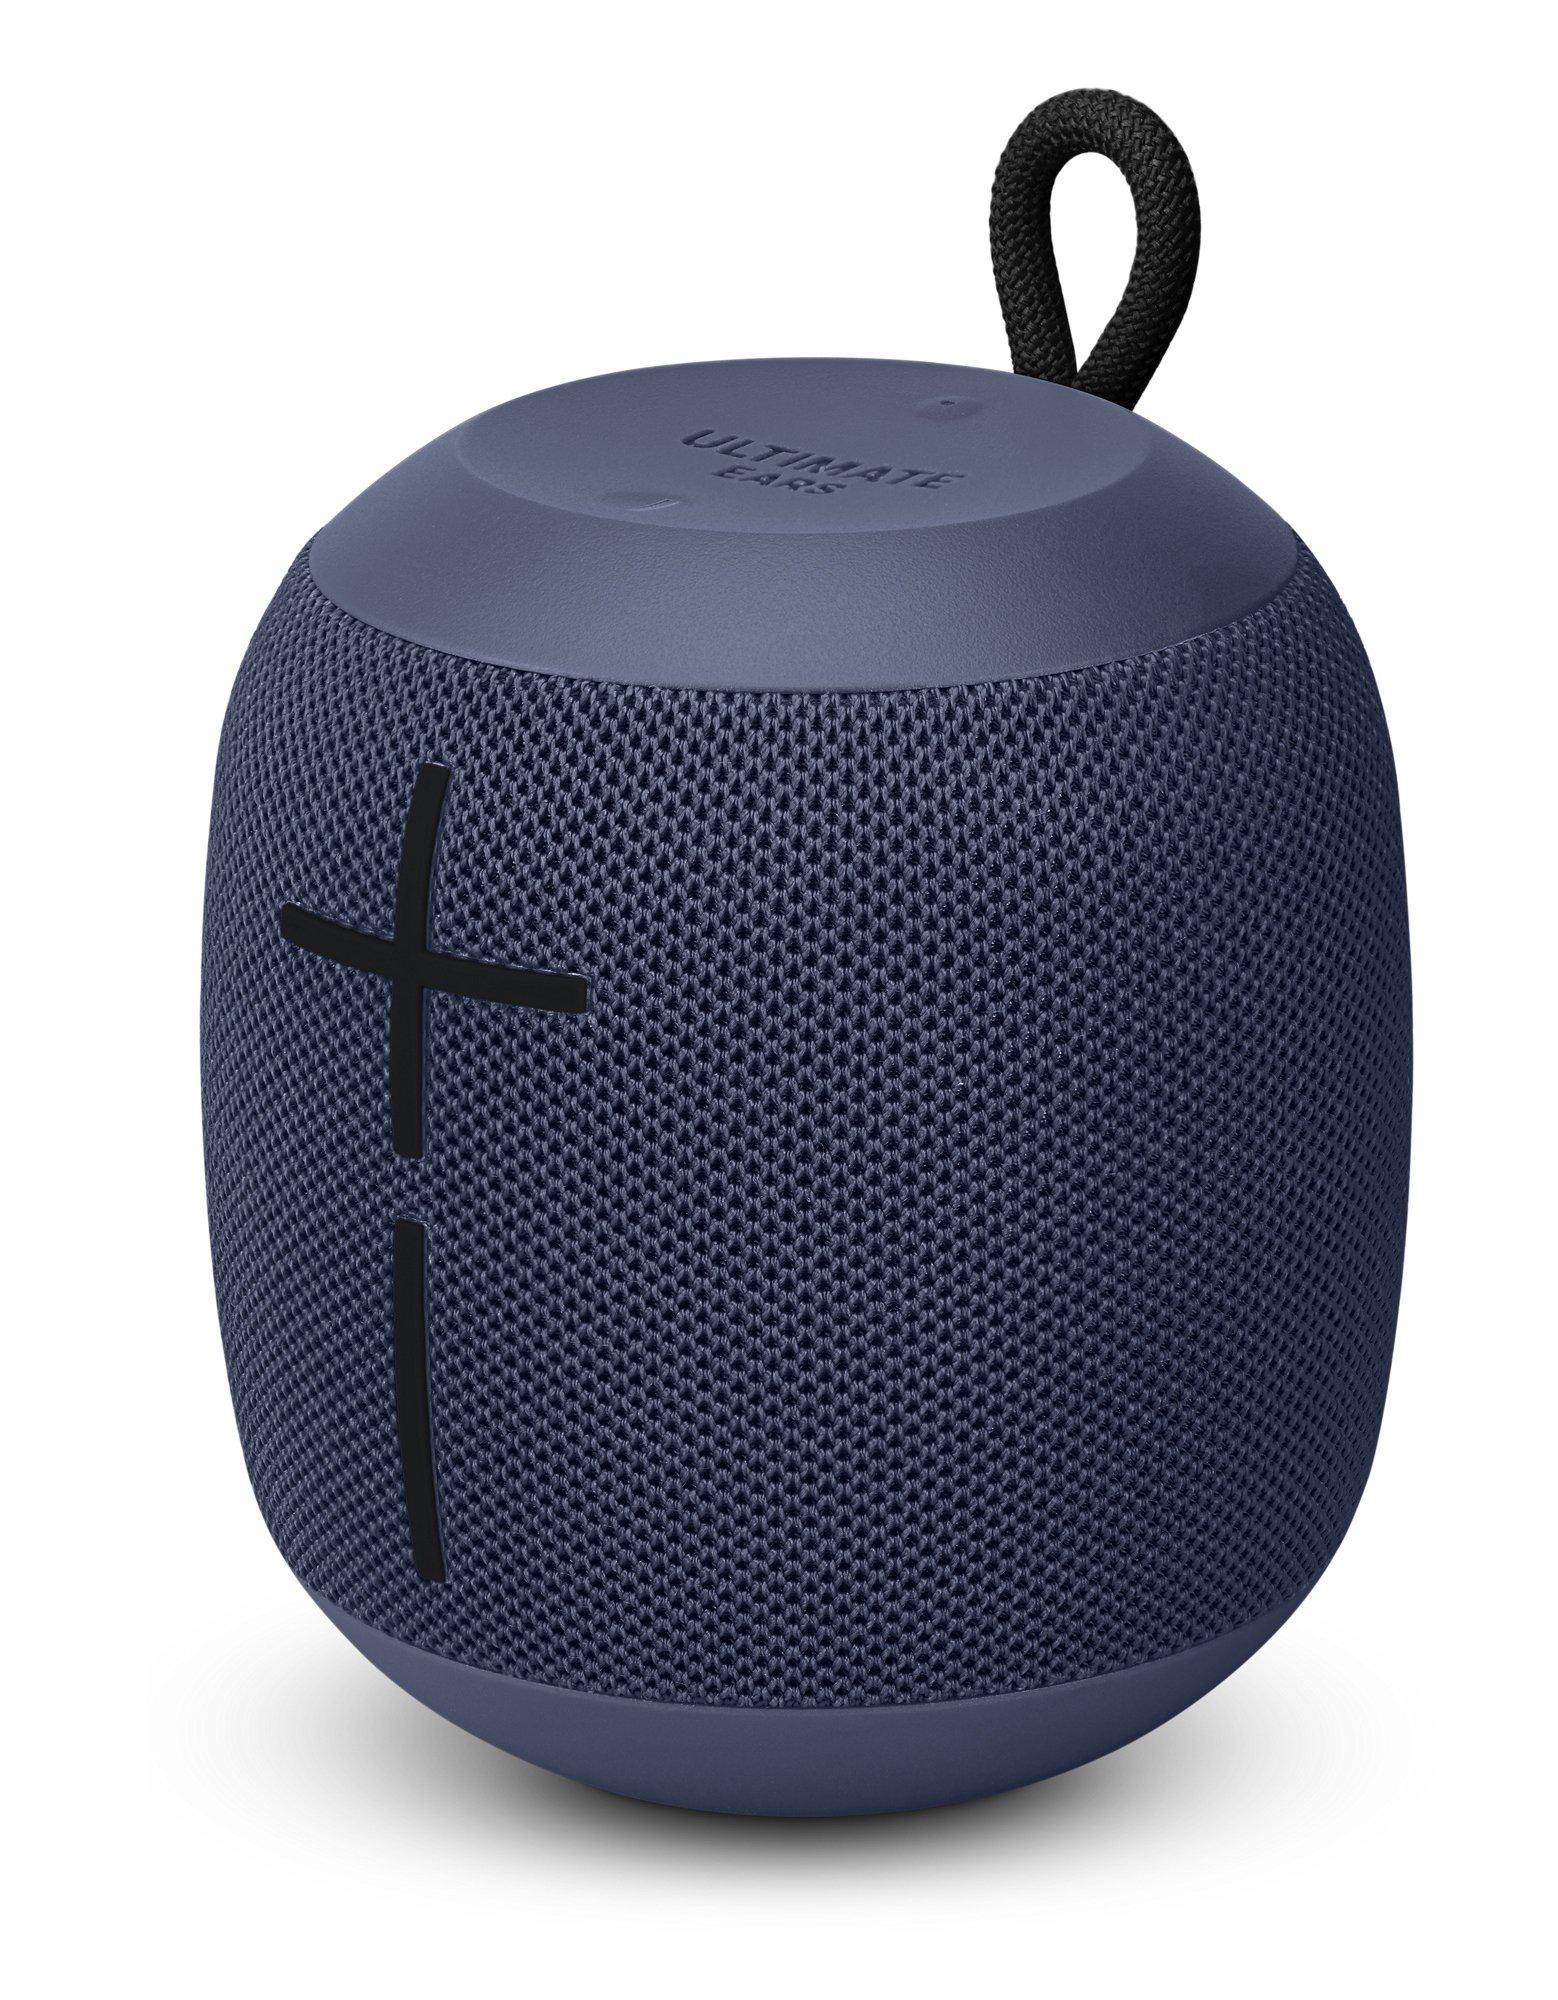 Ultimate Ears WONDERBOOM Waterproof Super Portable Bluetooth Speaker – IPX7 Waterproof – 10-hour Battery Life – Midnight Blue by Logitech (Image #2)